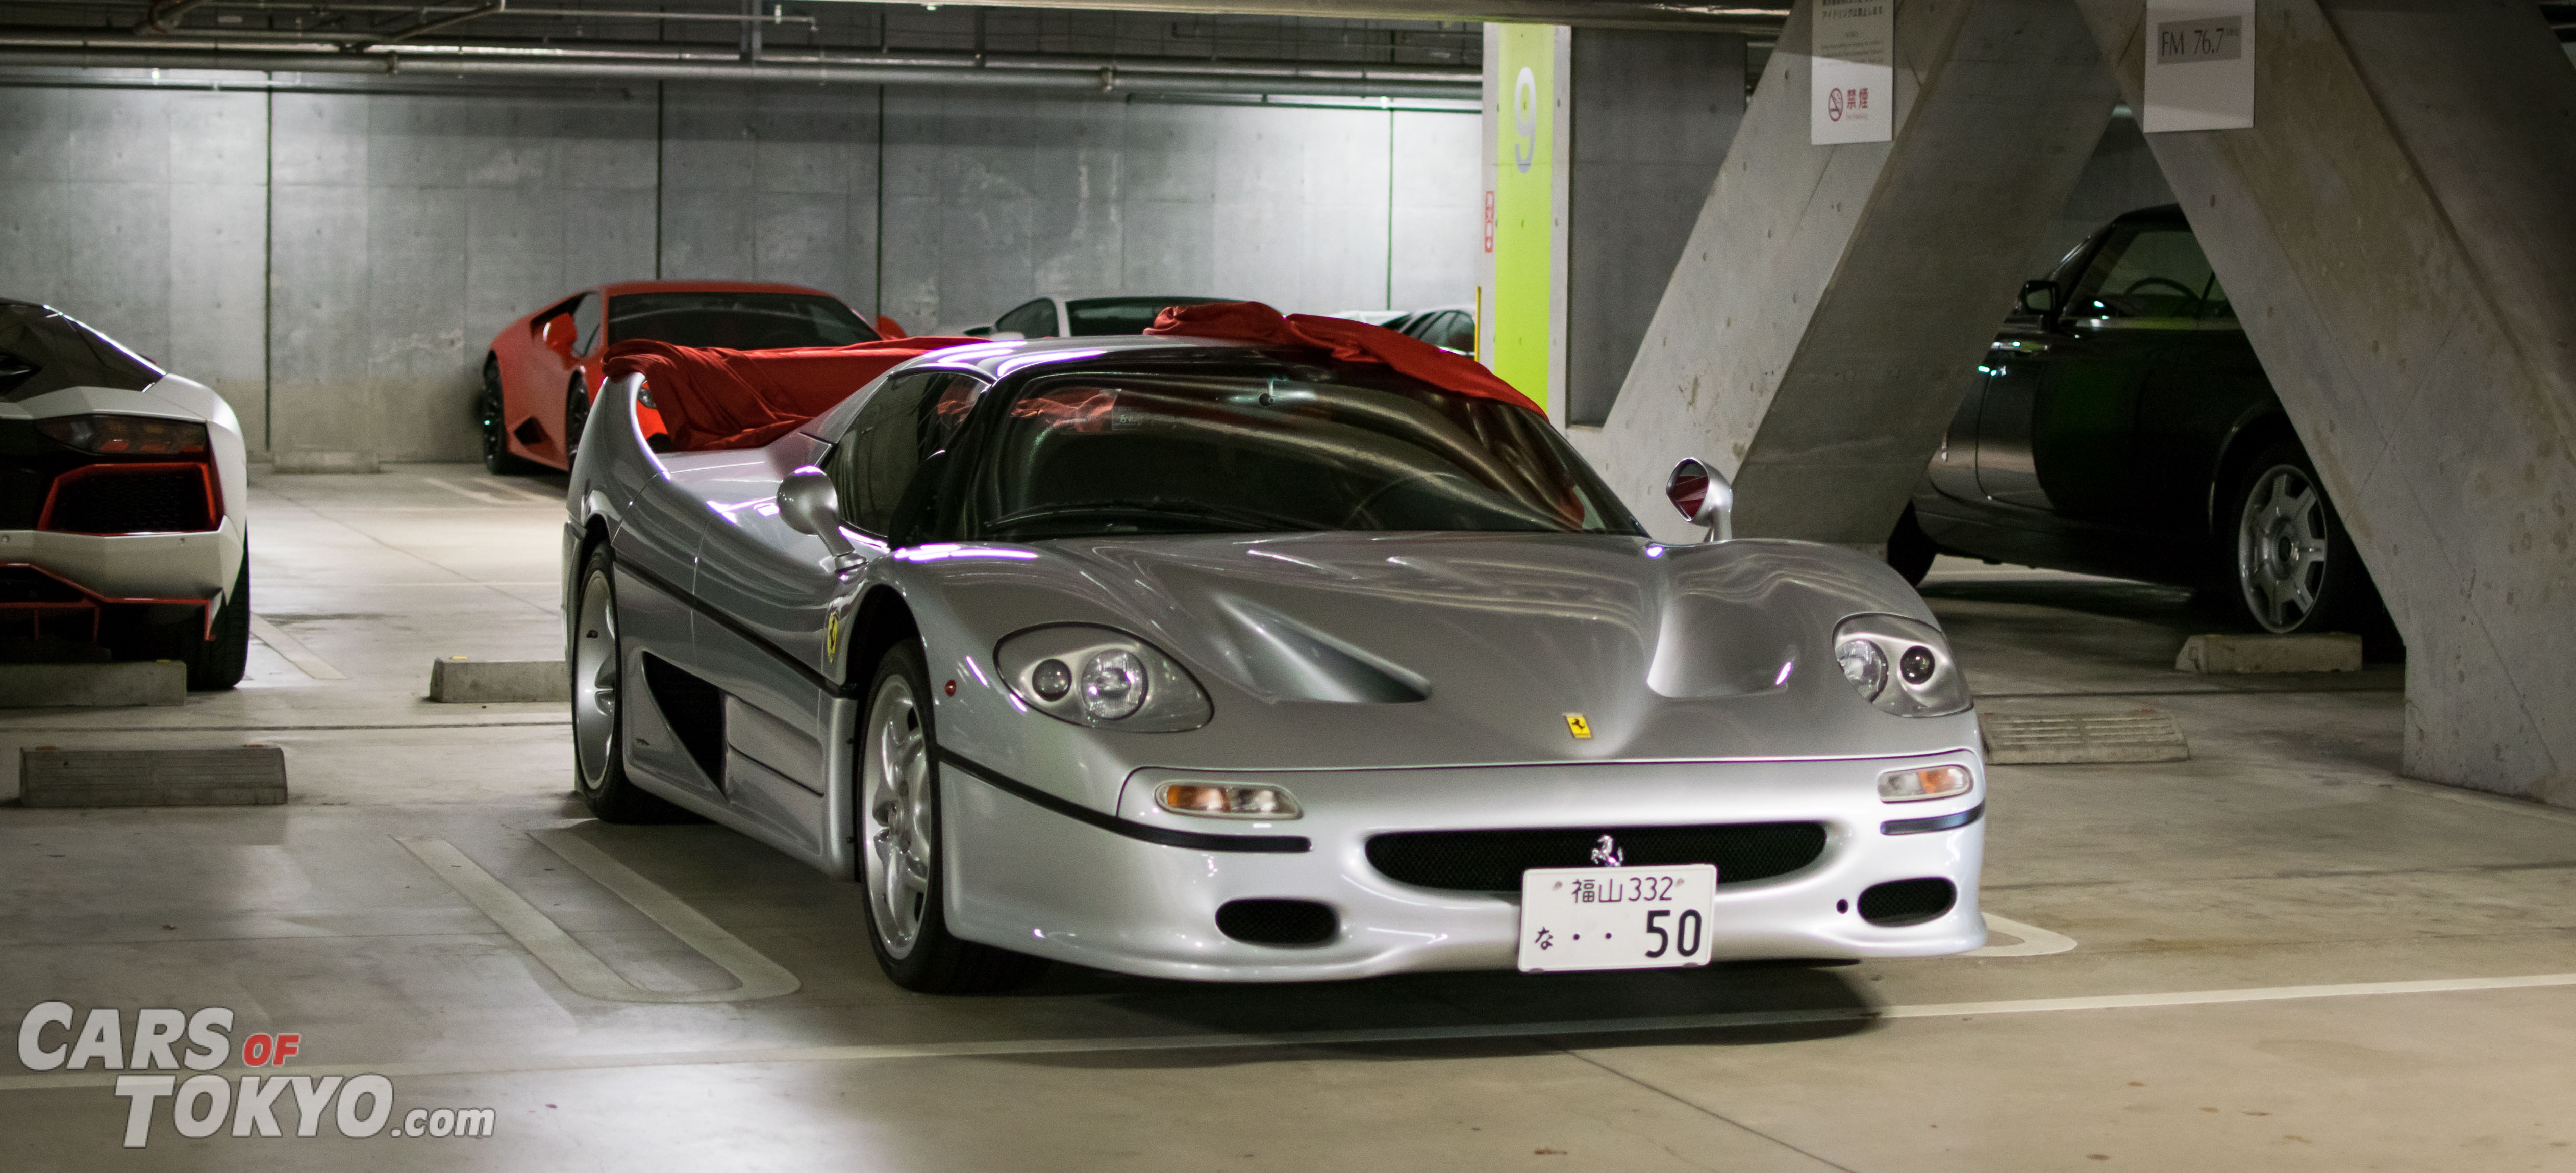 Cars of Tokyo Underground Ferrari F50